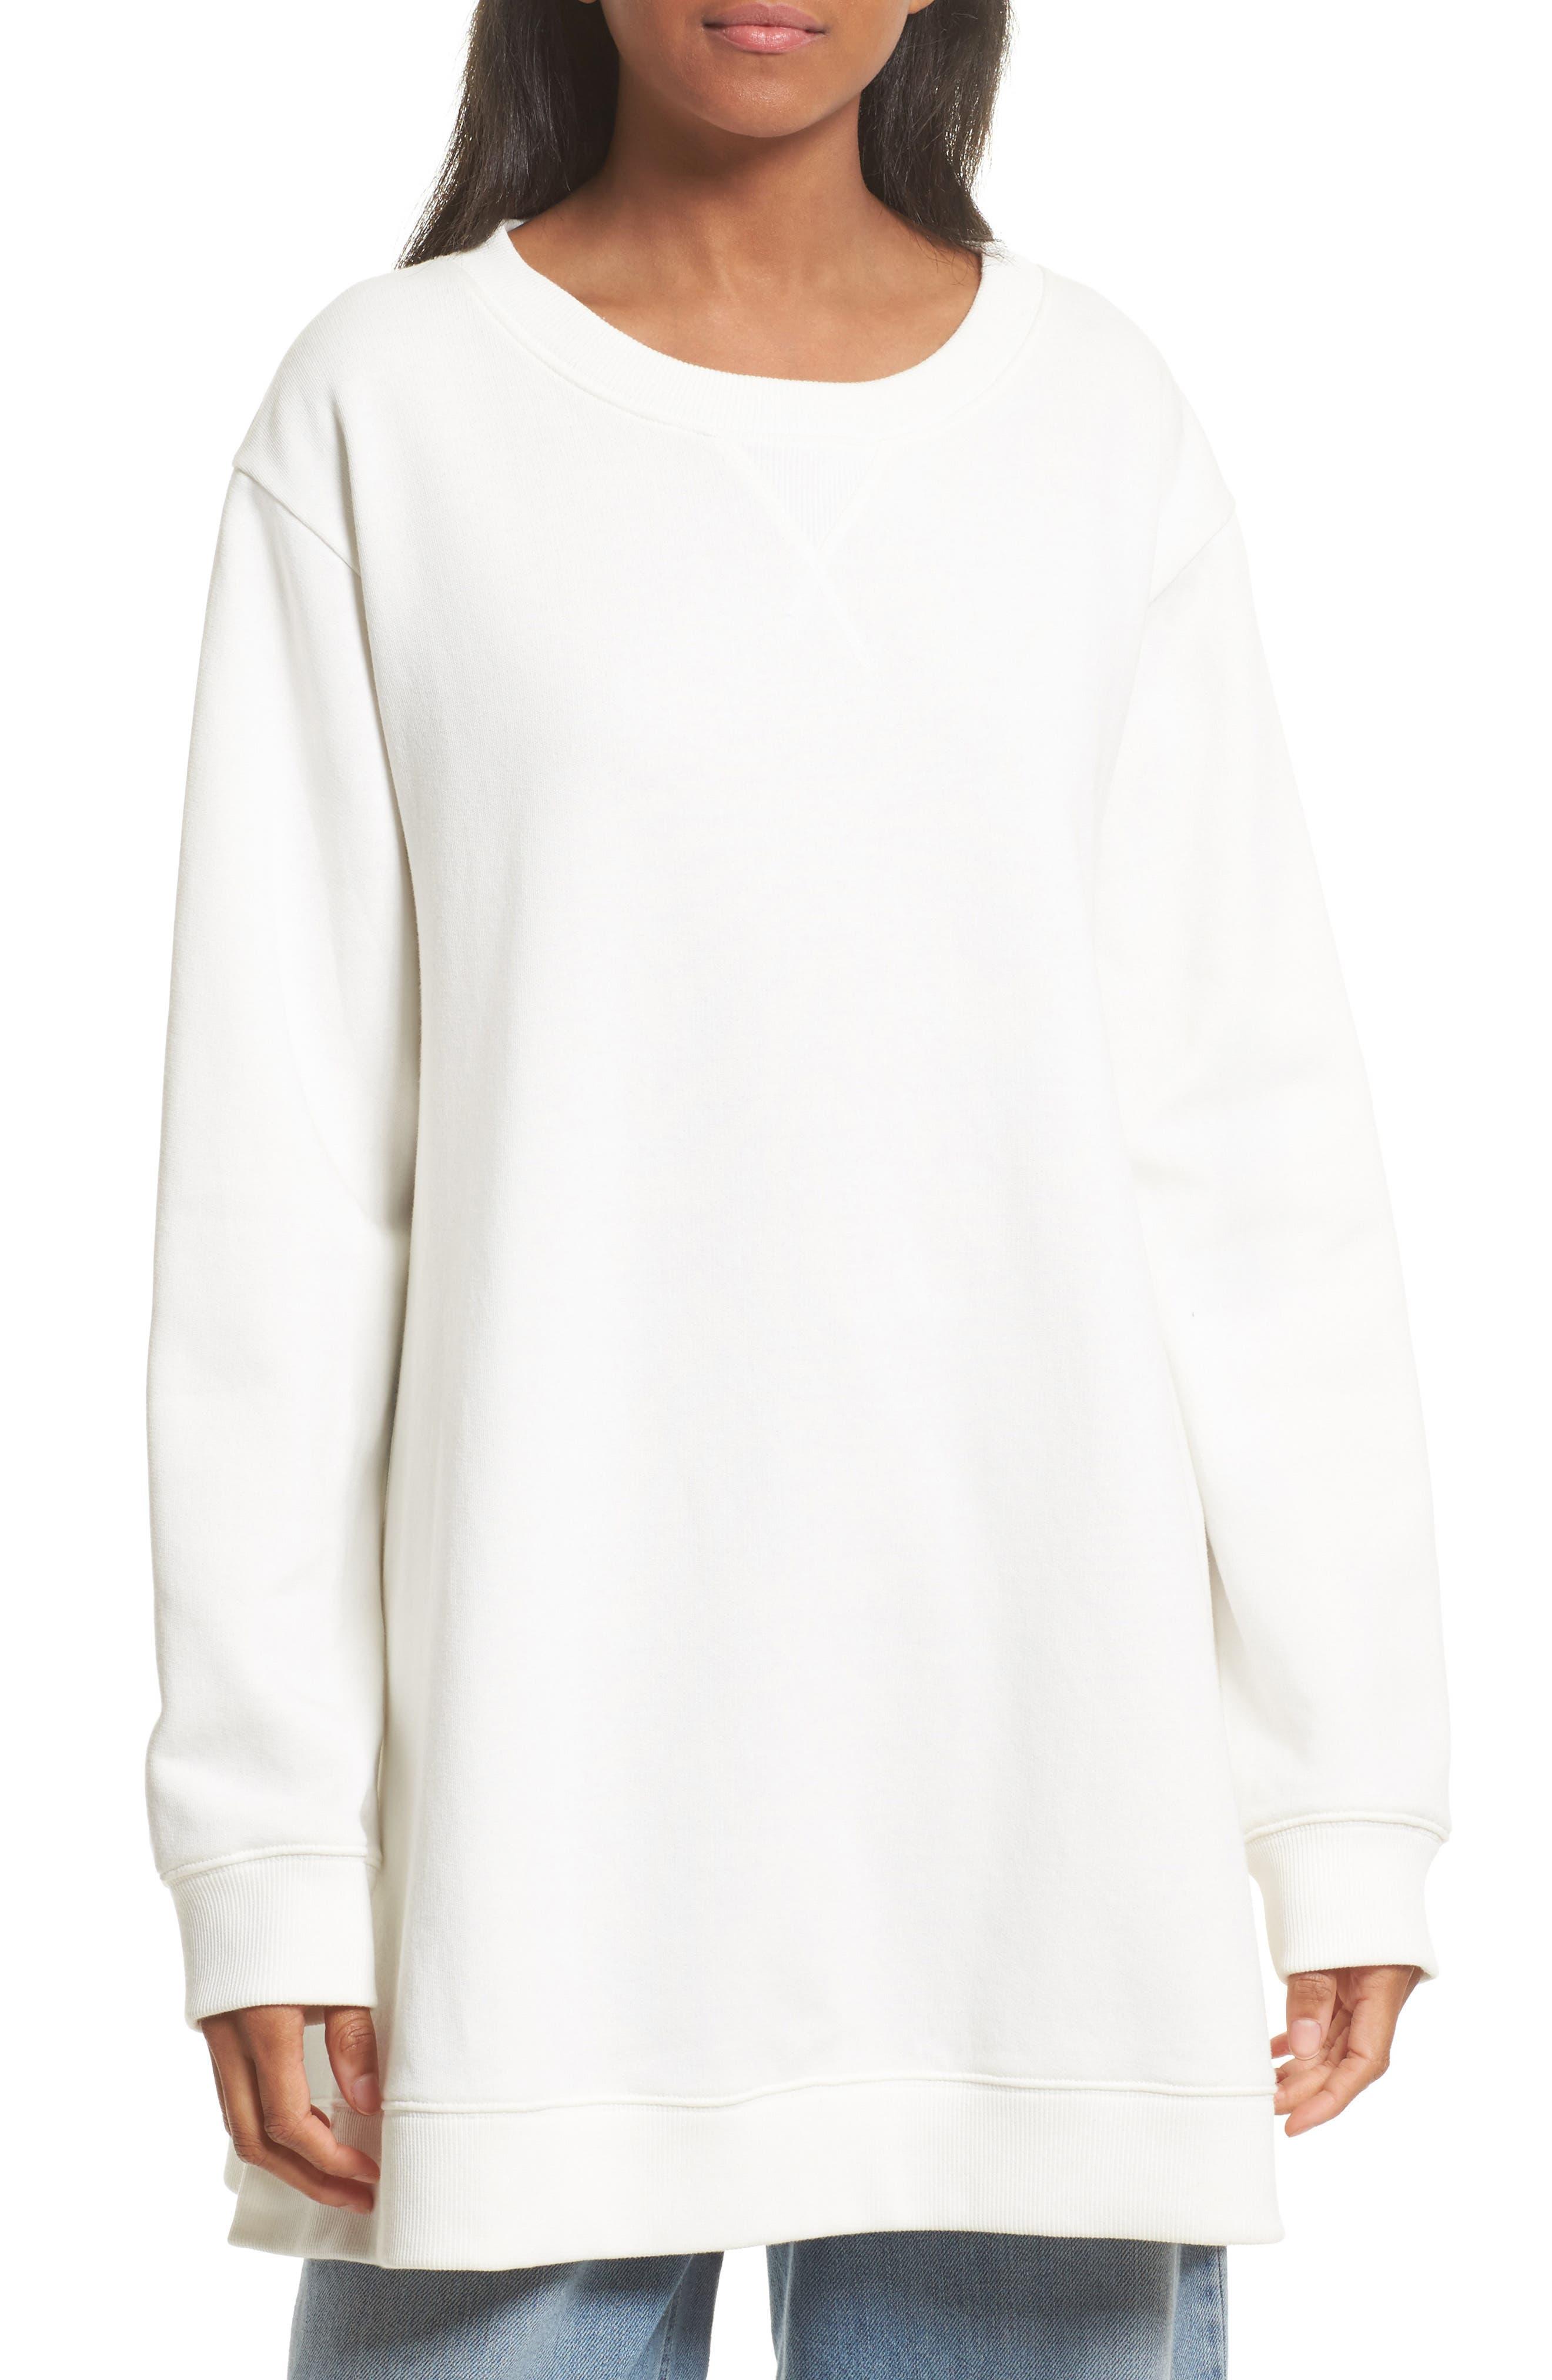 MM6 Maison Margiela Oversize Sweatshirt